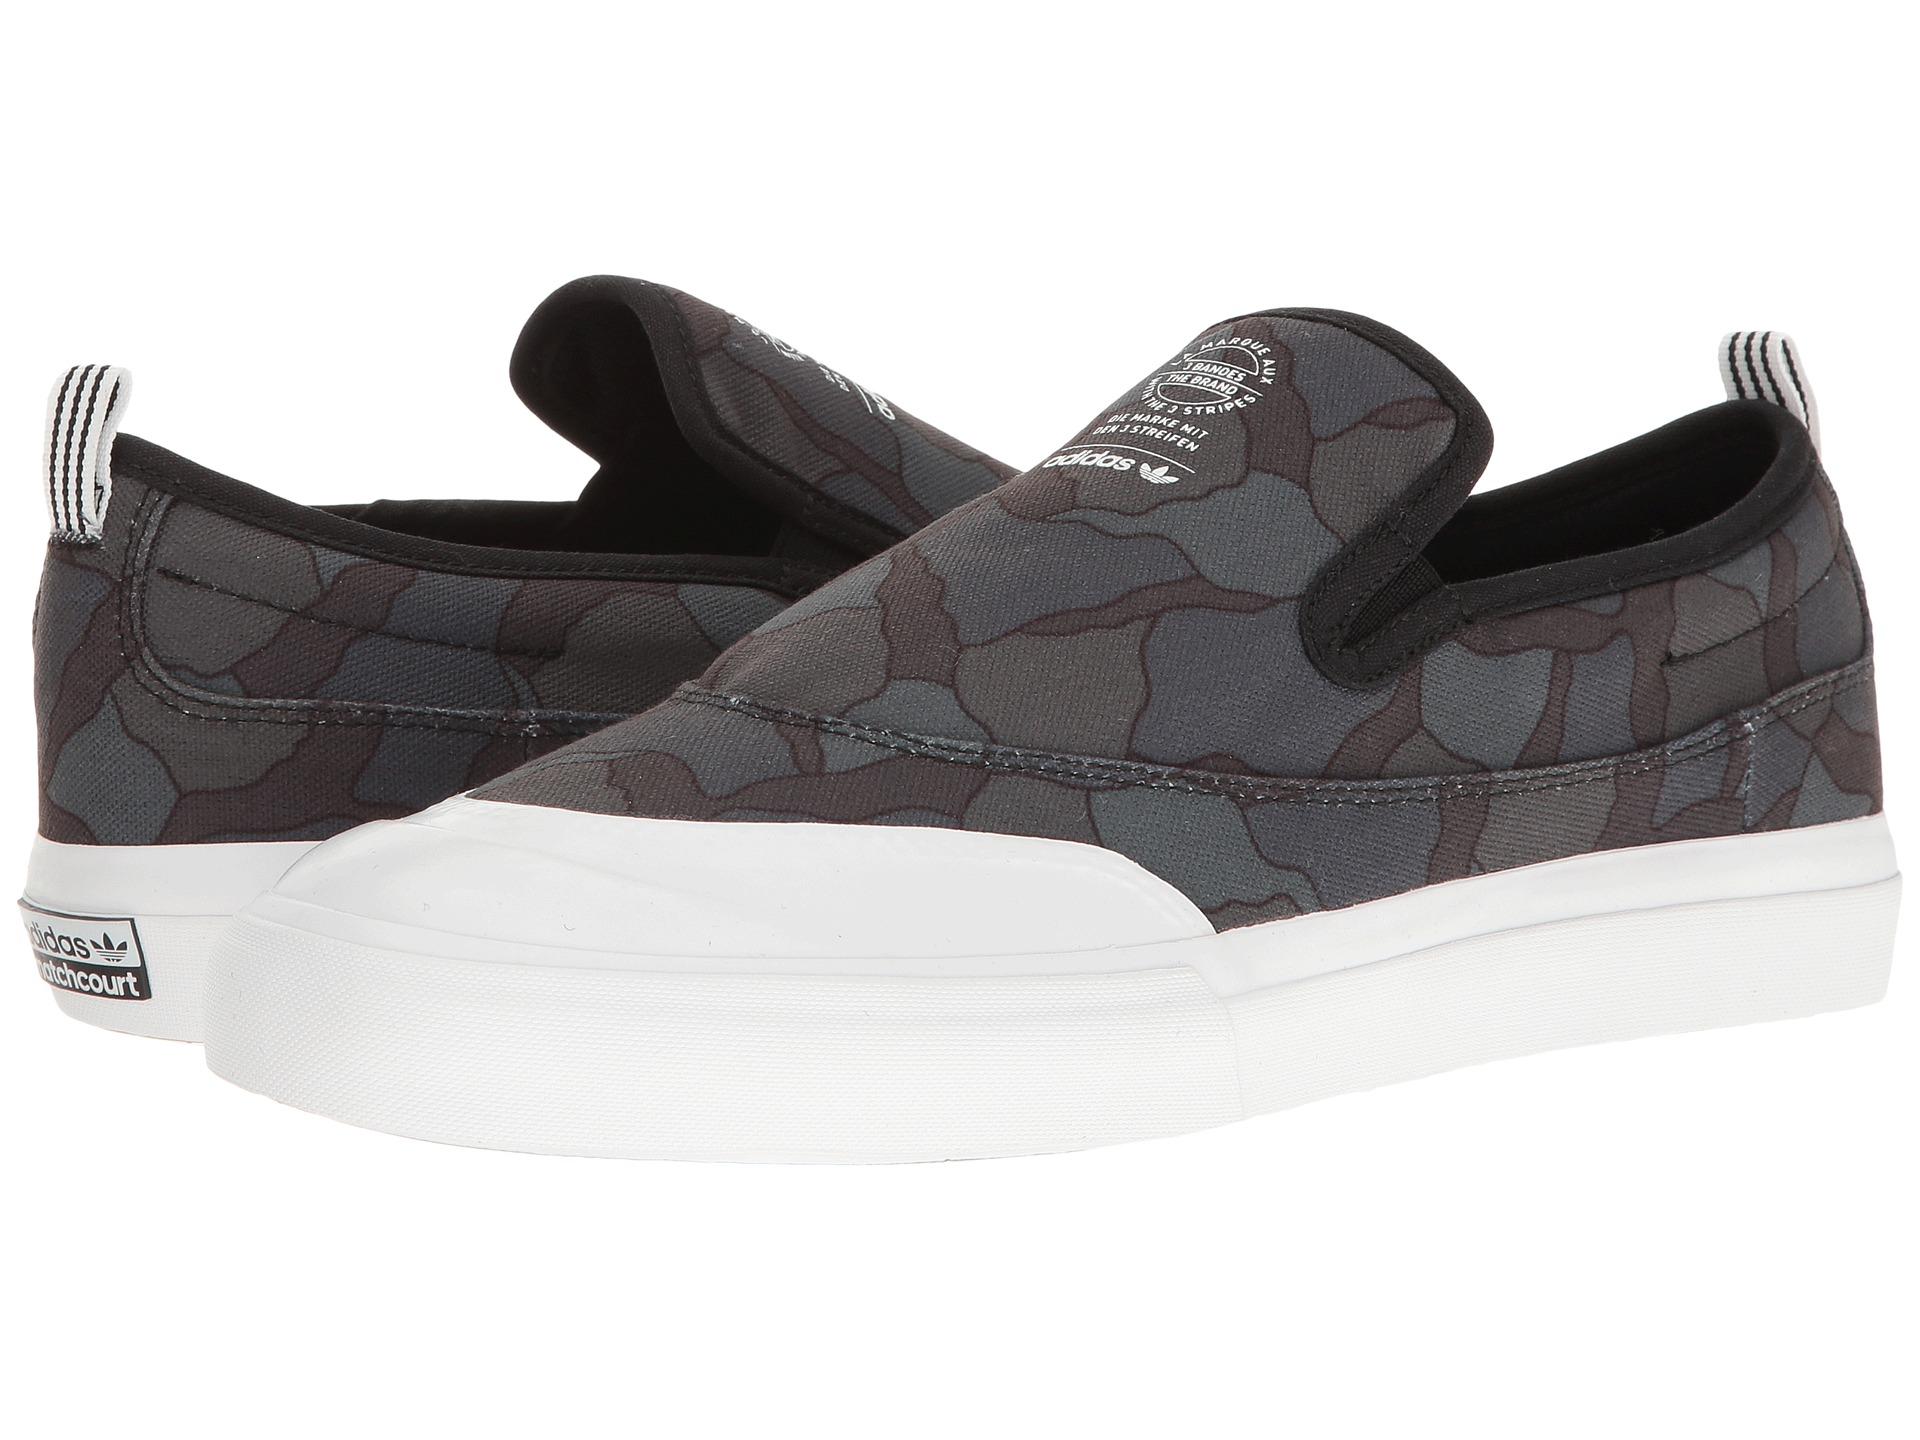 adidas Skateboarding Matchcourt Slip ADV at 6pm.com